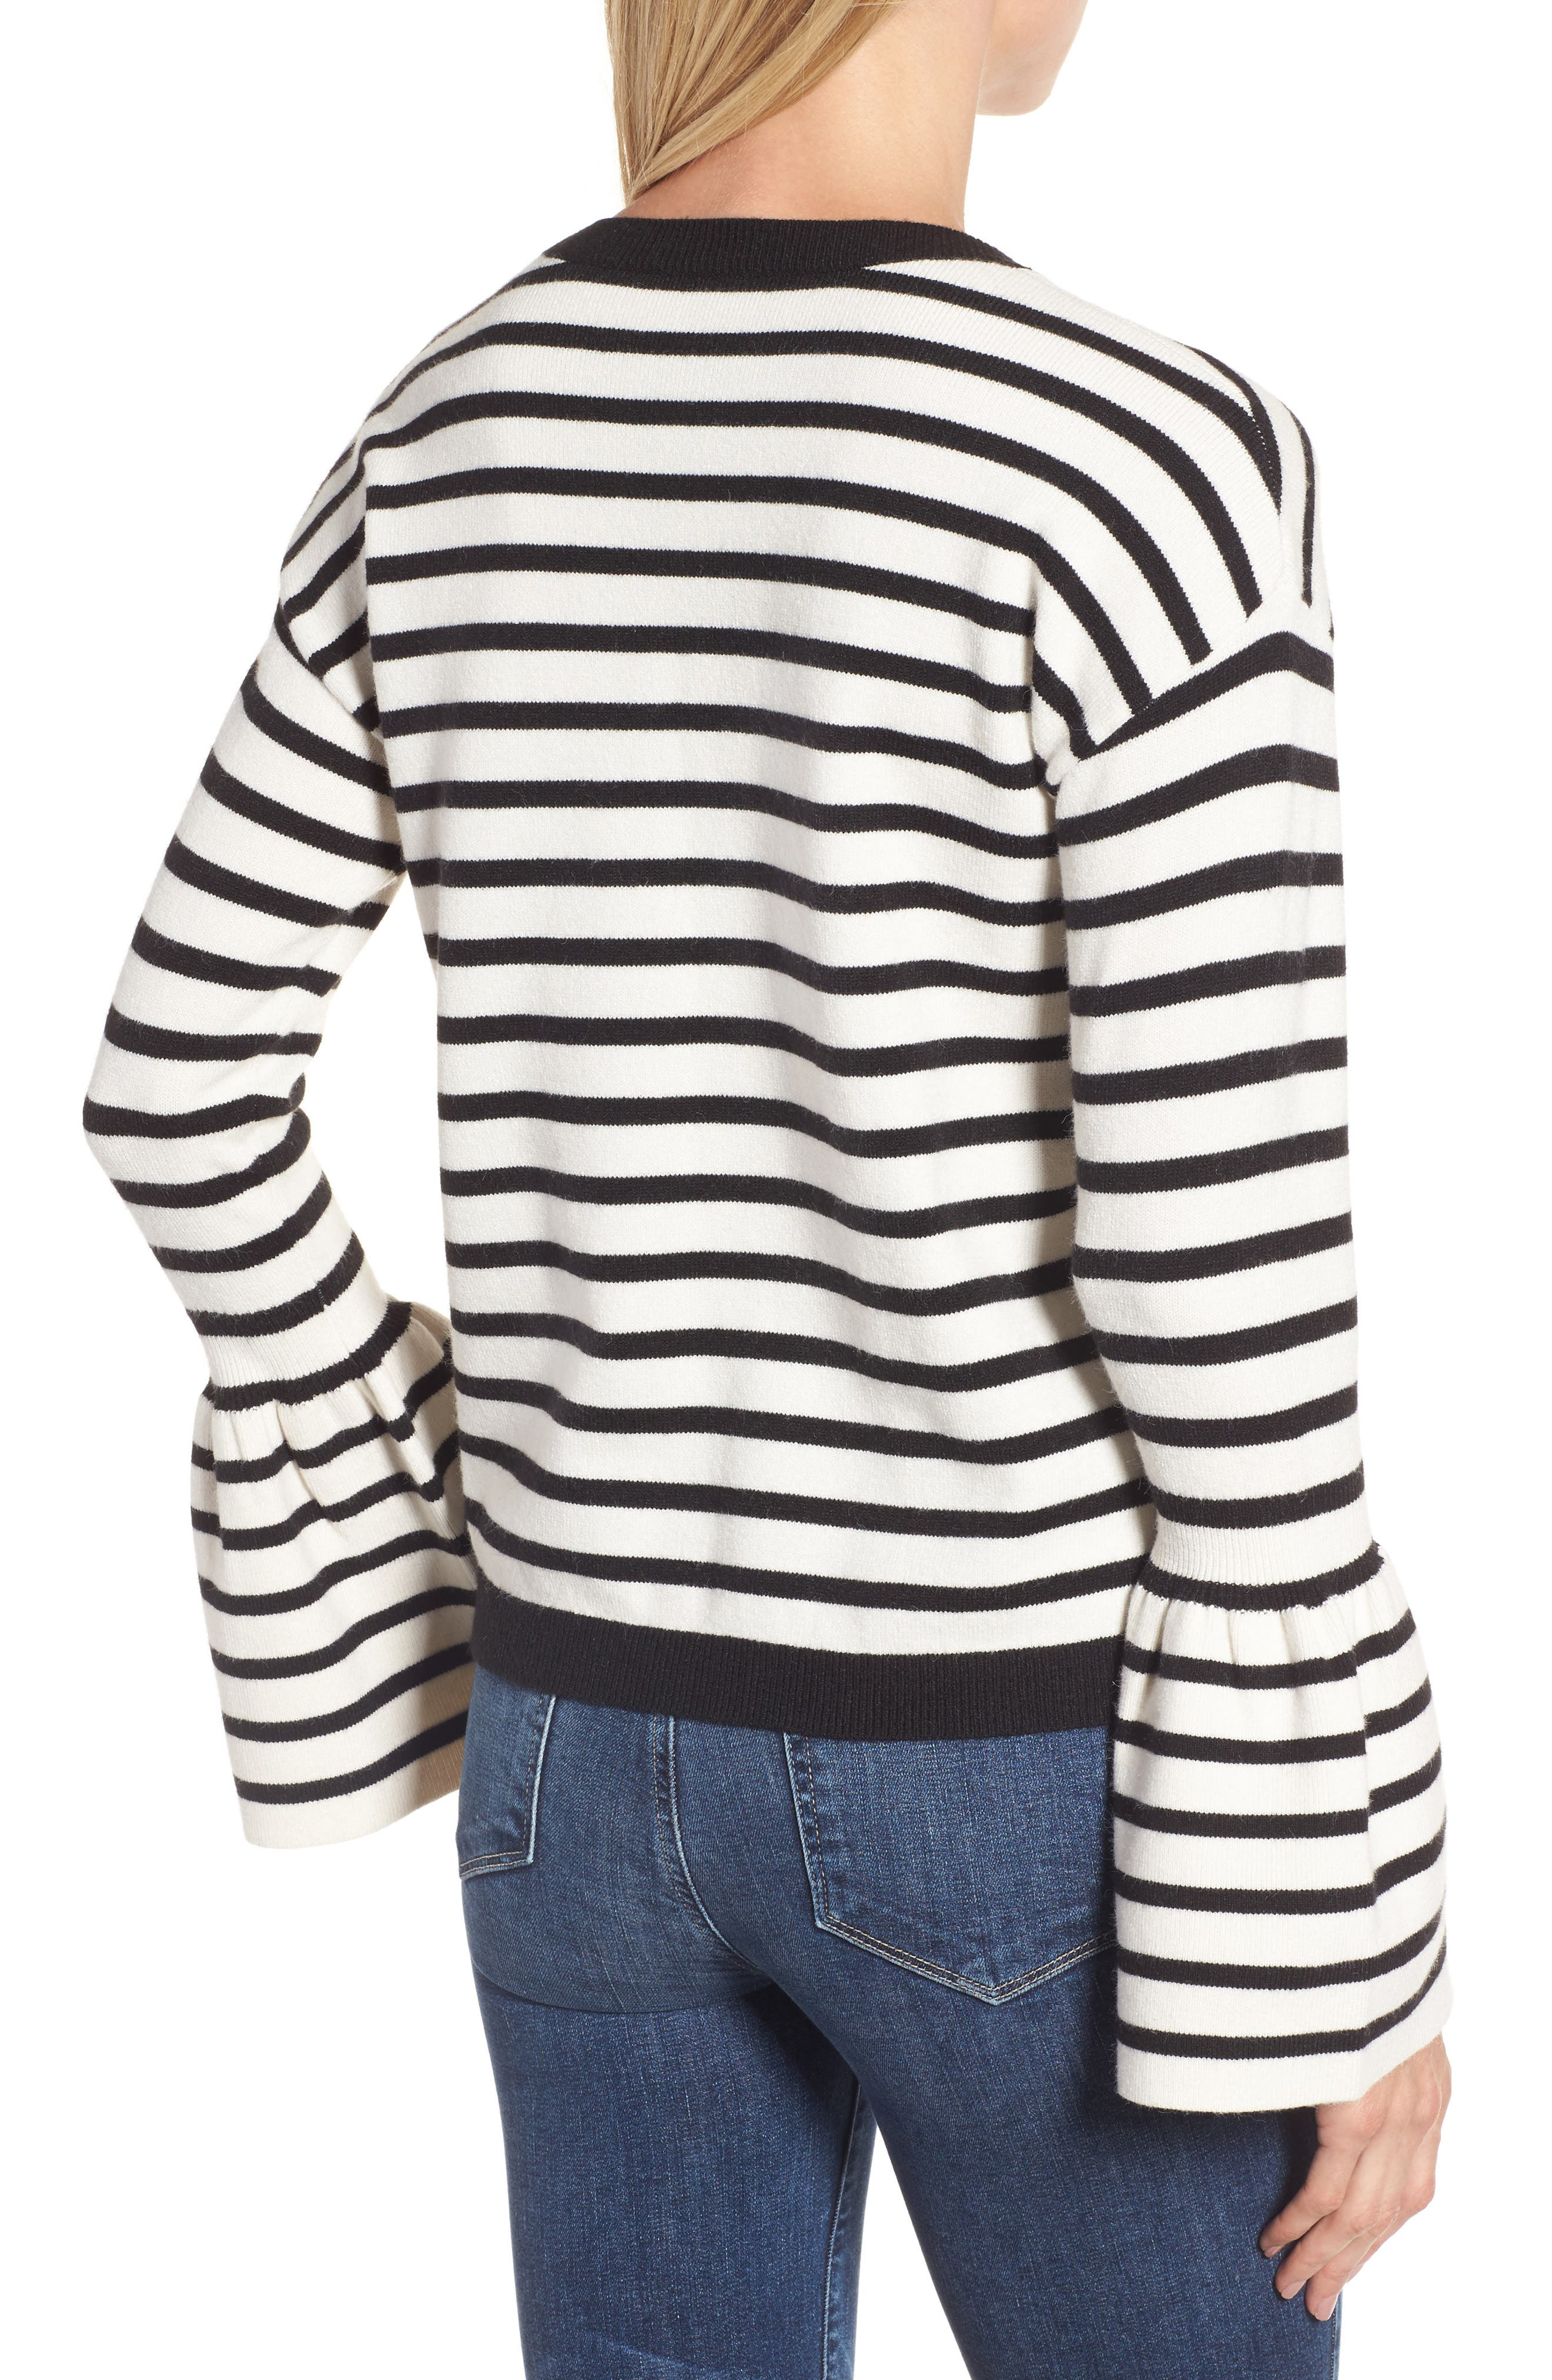 Bell Sleeve Sweater,                             Alternate thumbnail 2, color,                             Black- Ivory Stripe